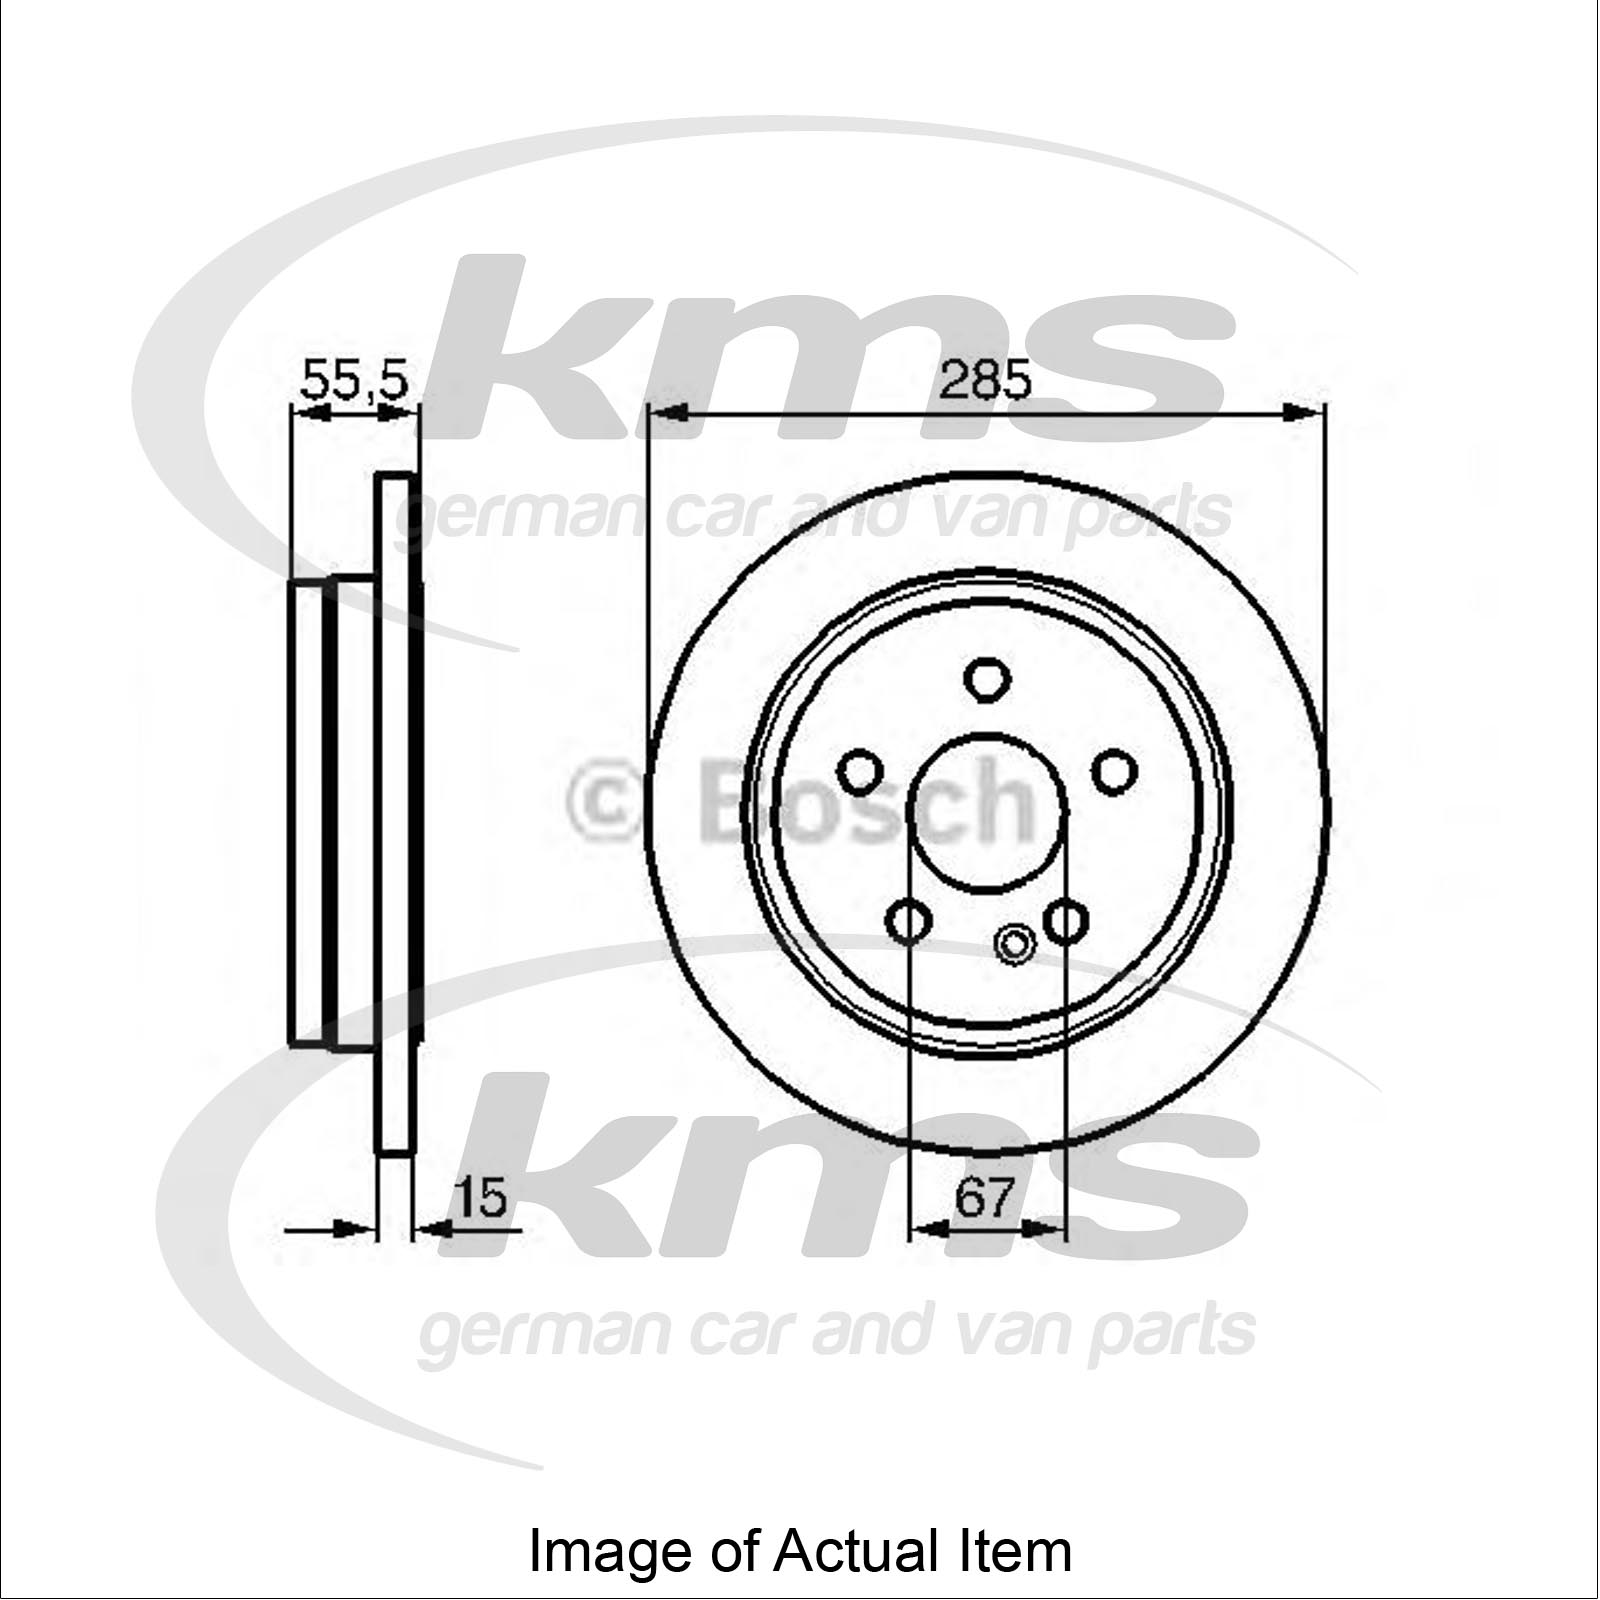 Brake Disc Mercedes M Class W163 Ml 270 Cdi 163 113 Closed Off Road Vehicle